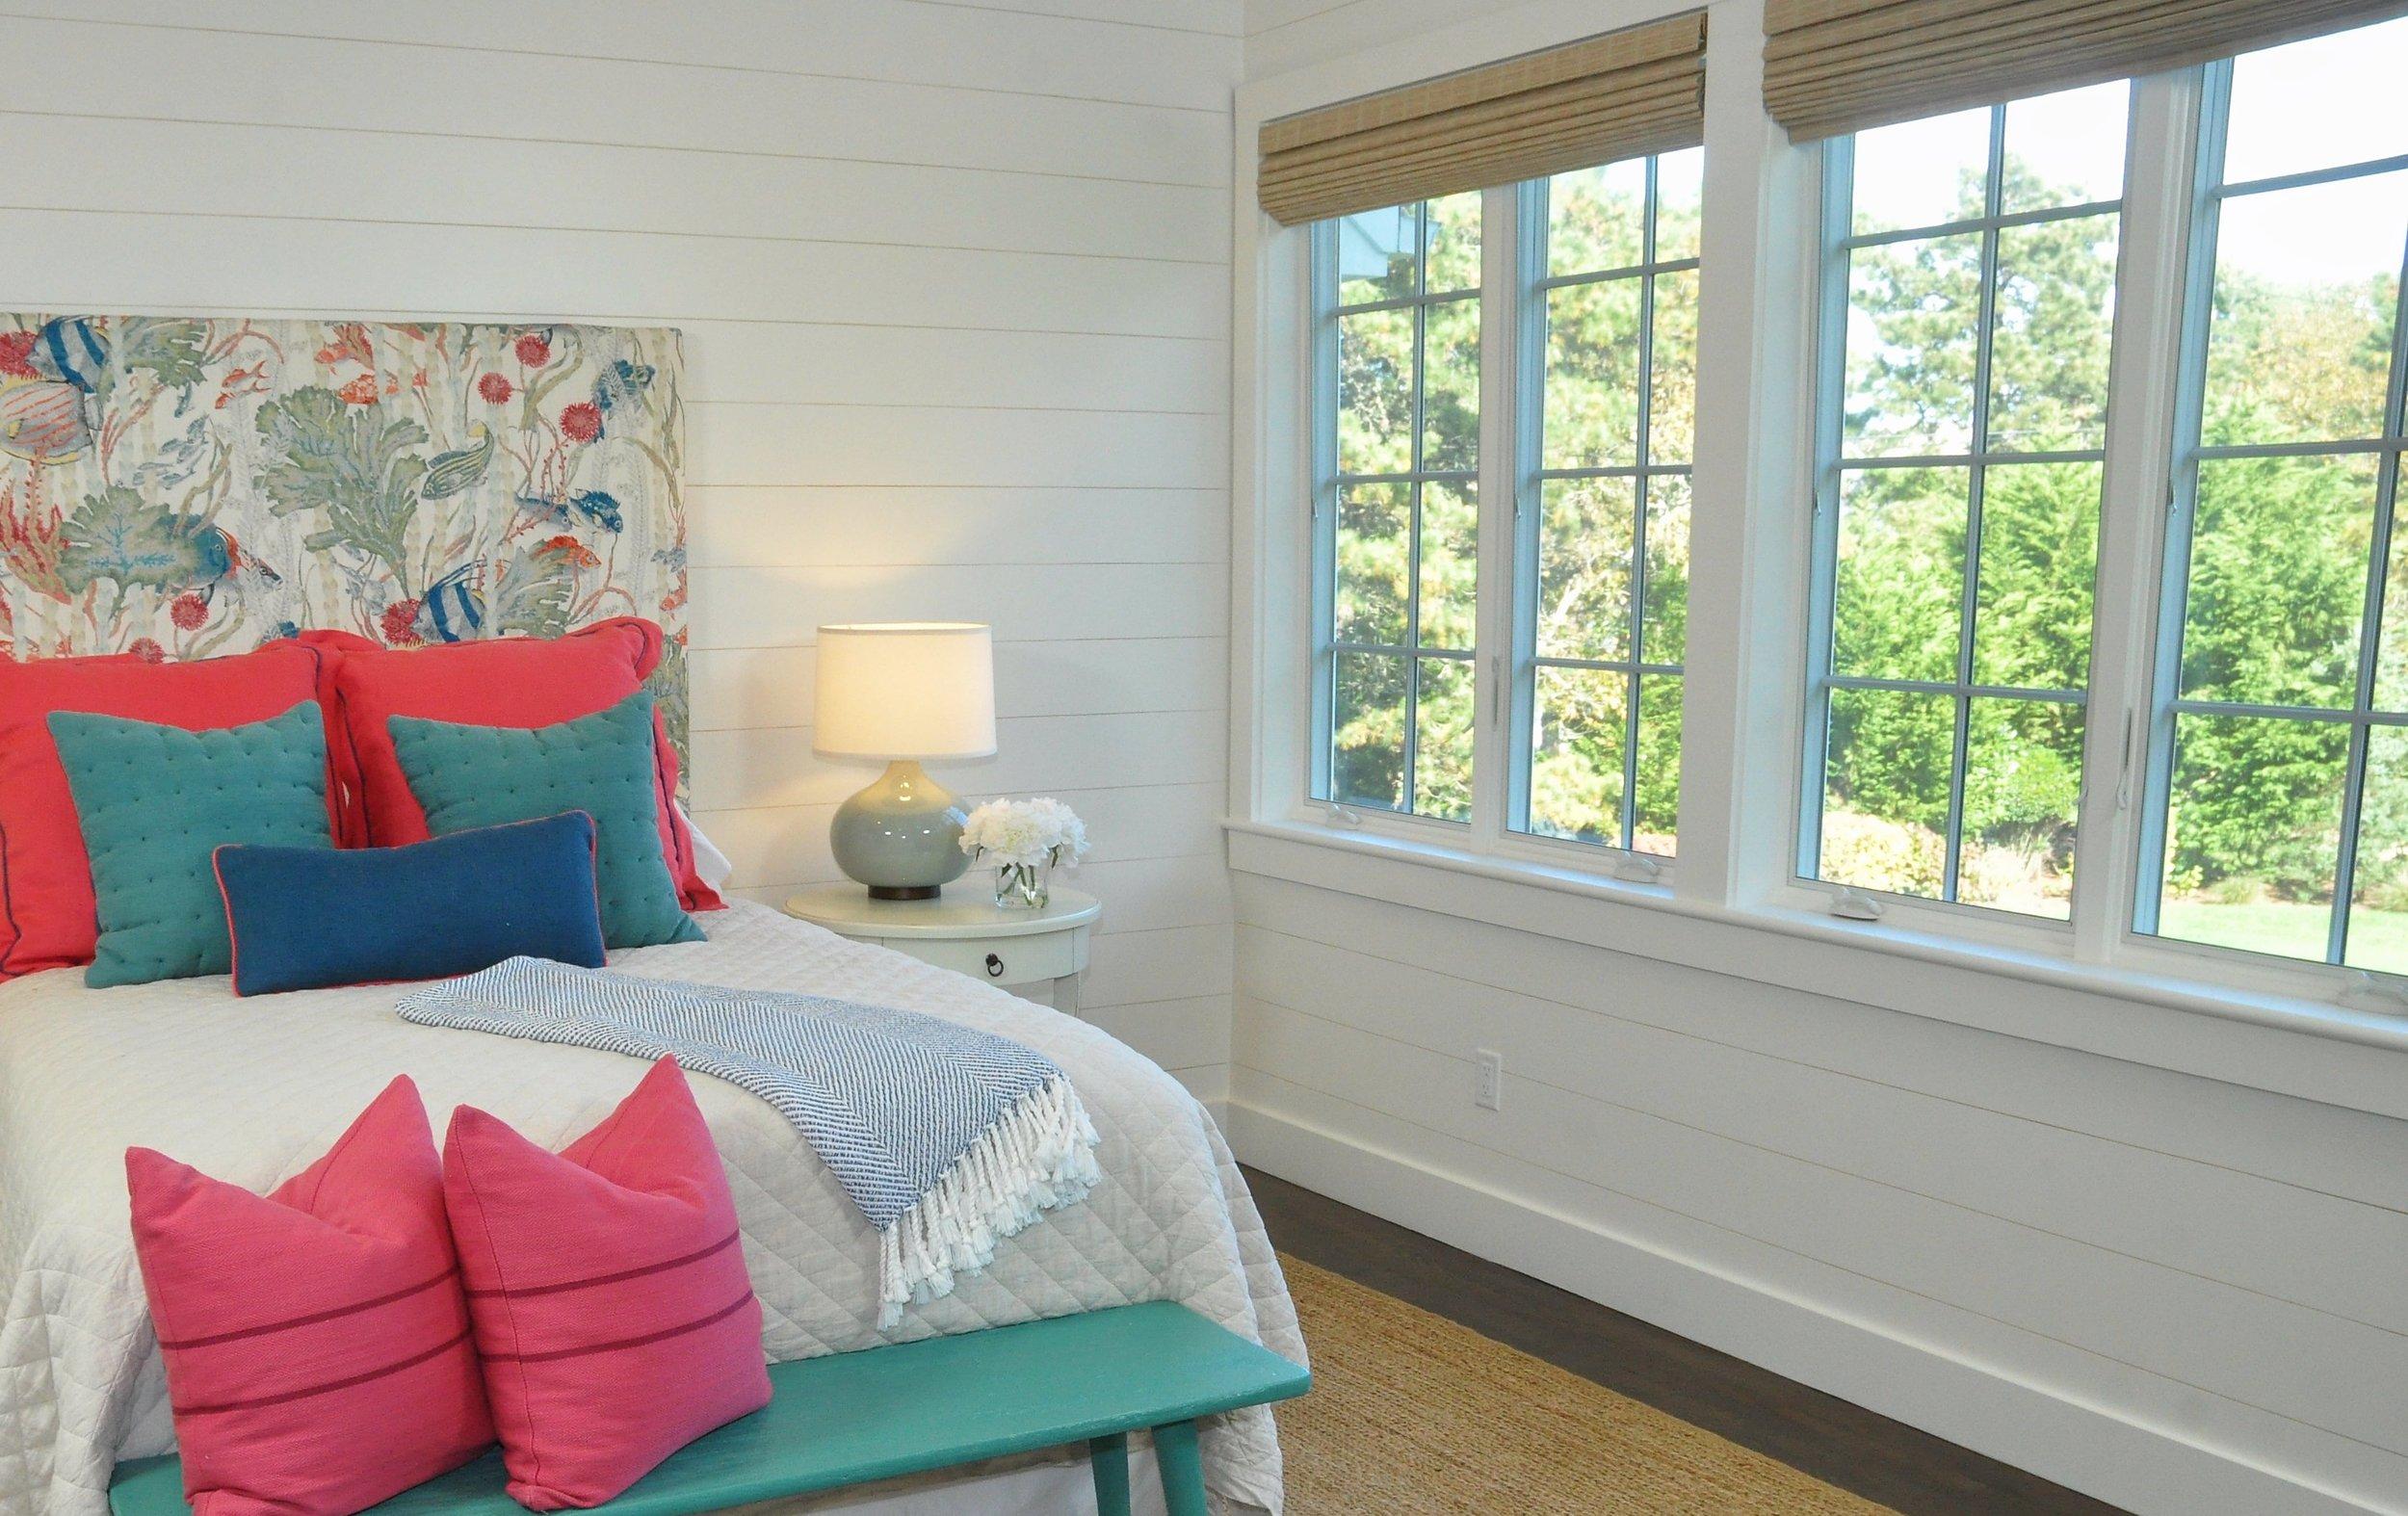 Modern_Farmhouse_Bedroom.jpg